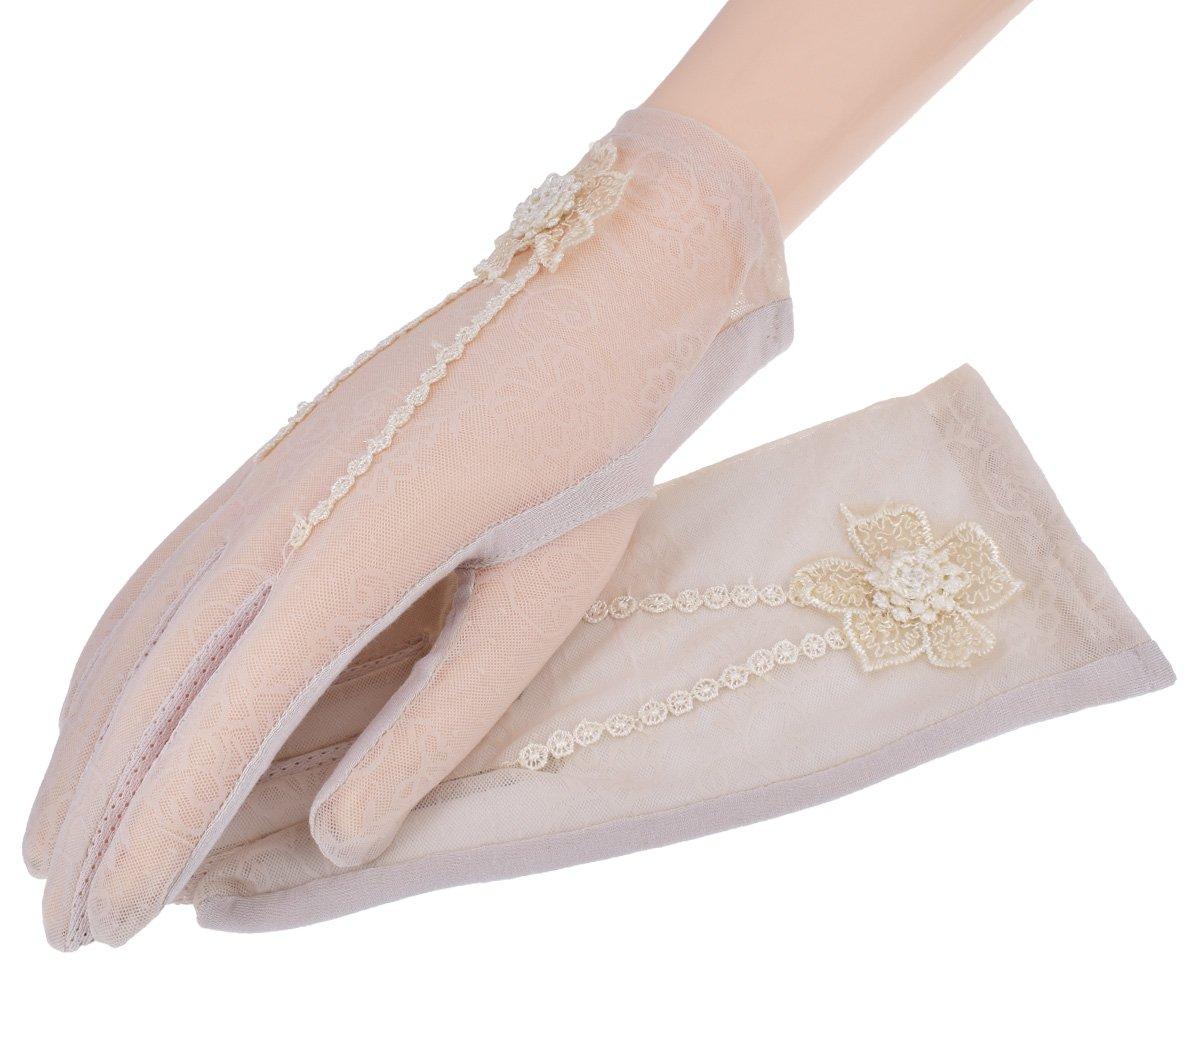 Nurbijar Summer Women UV Protection Touch Screen Lace Gloves-Beige